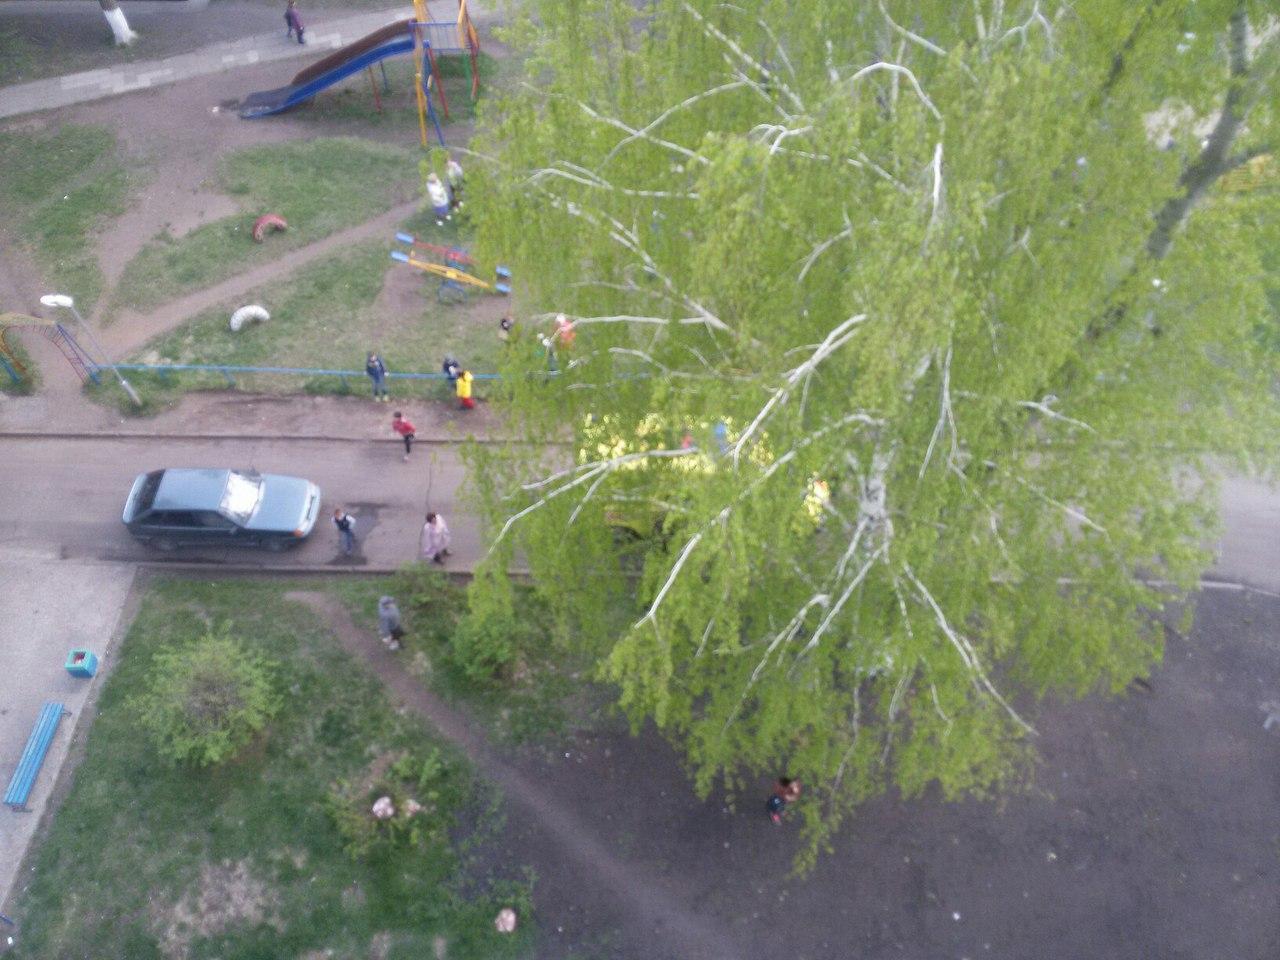 ВТатарстане ребенок  умер  надетской площадке